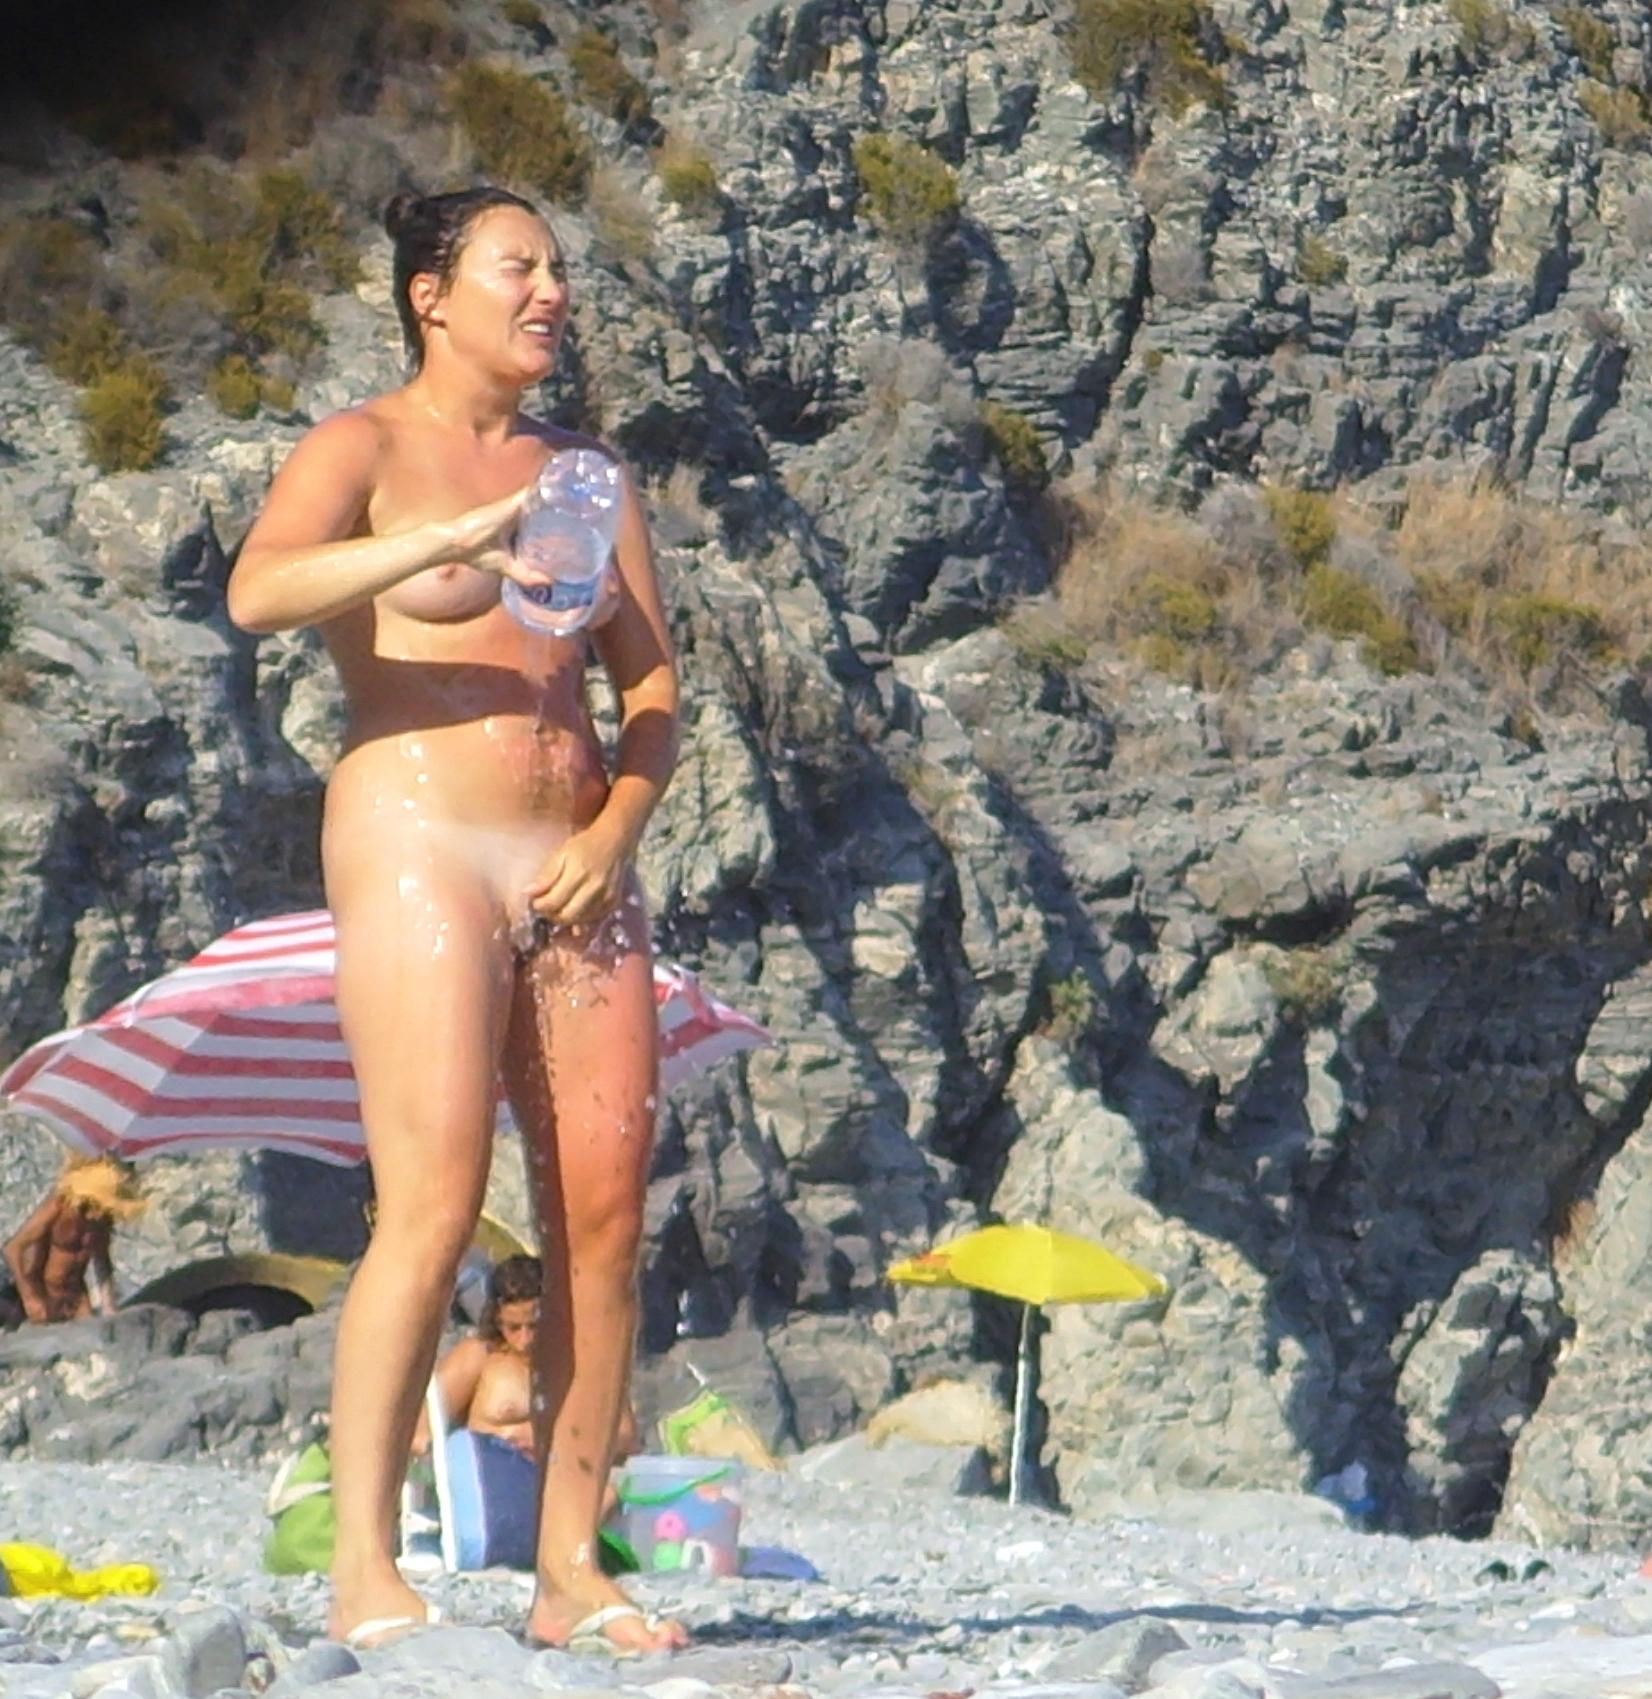 Pretty Nudist Dasha Pics  Younges Nudizm Teens